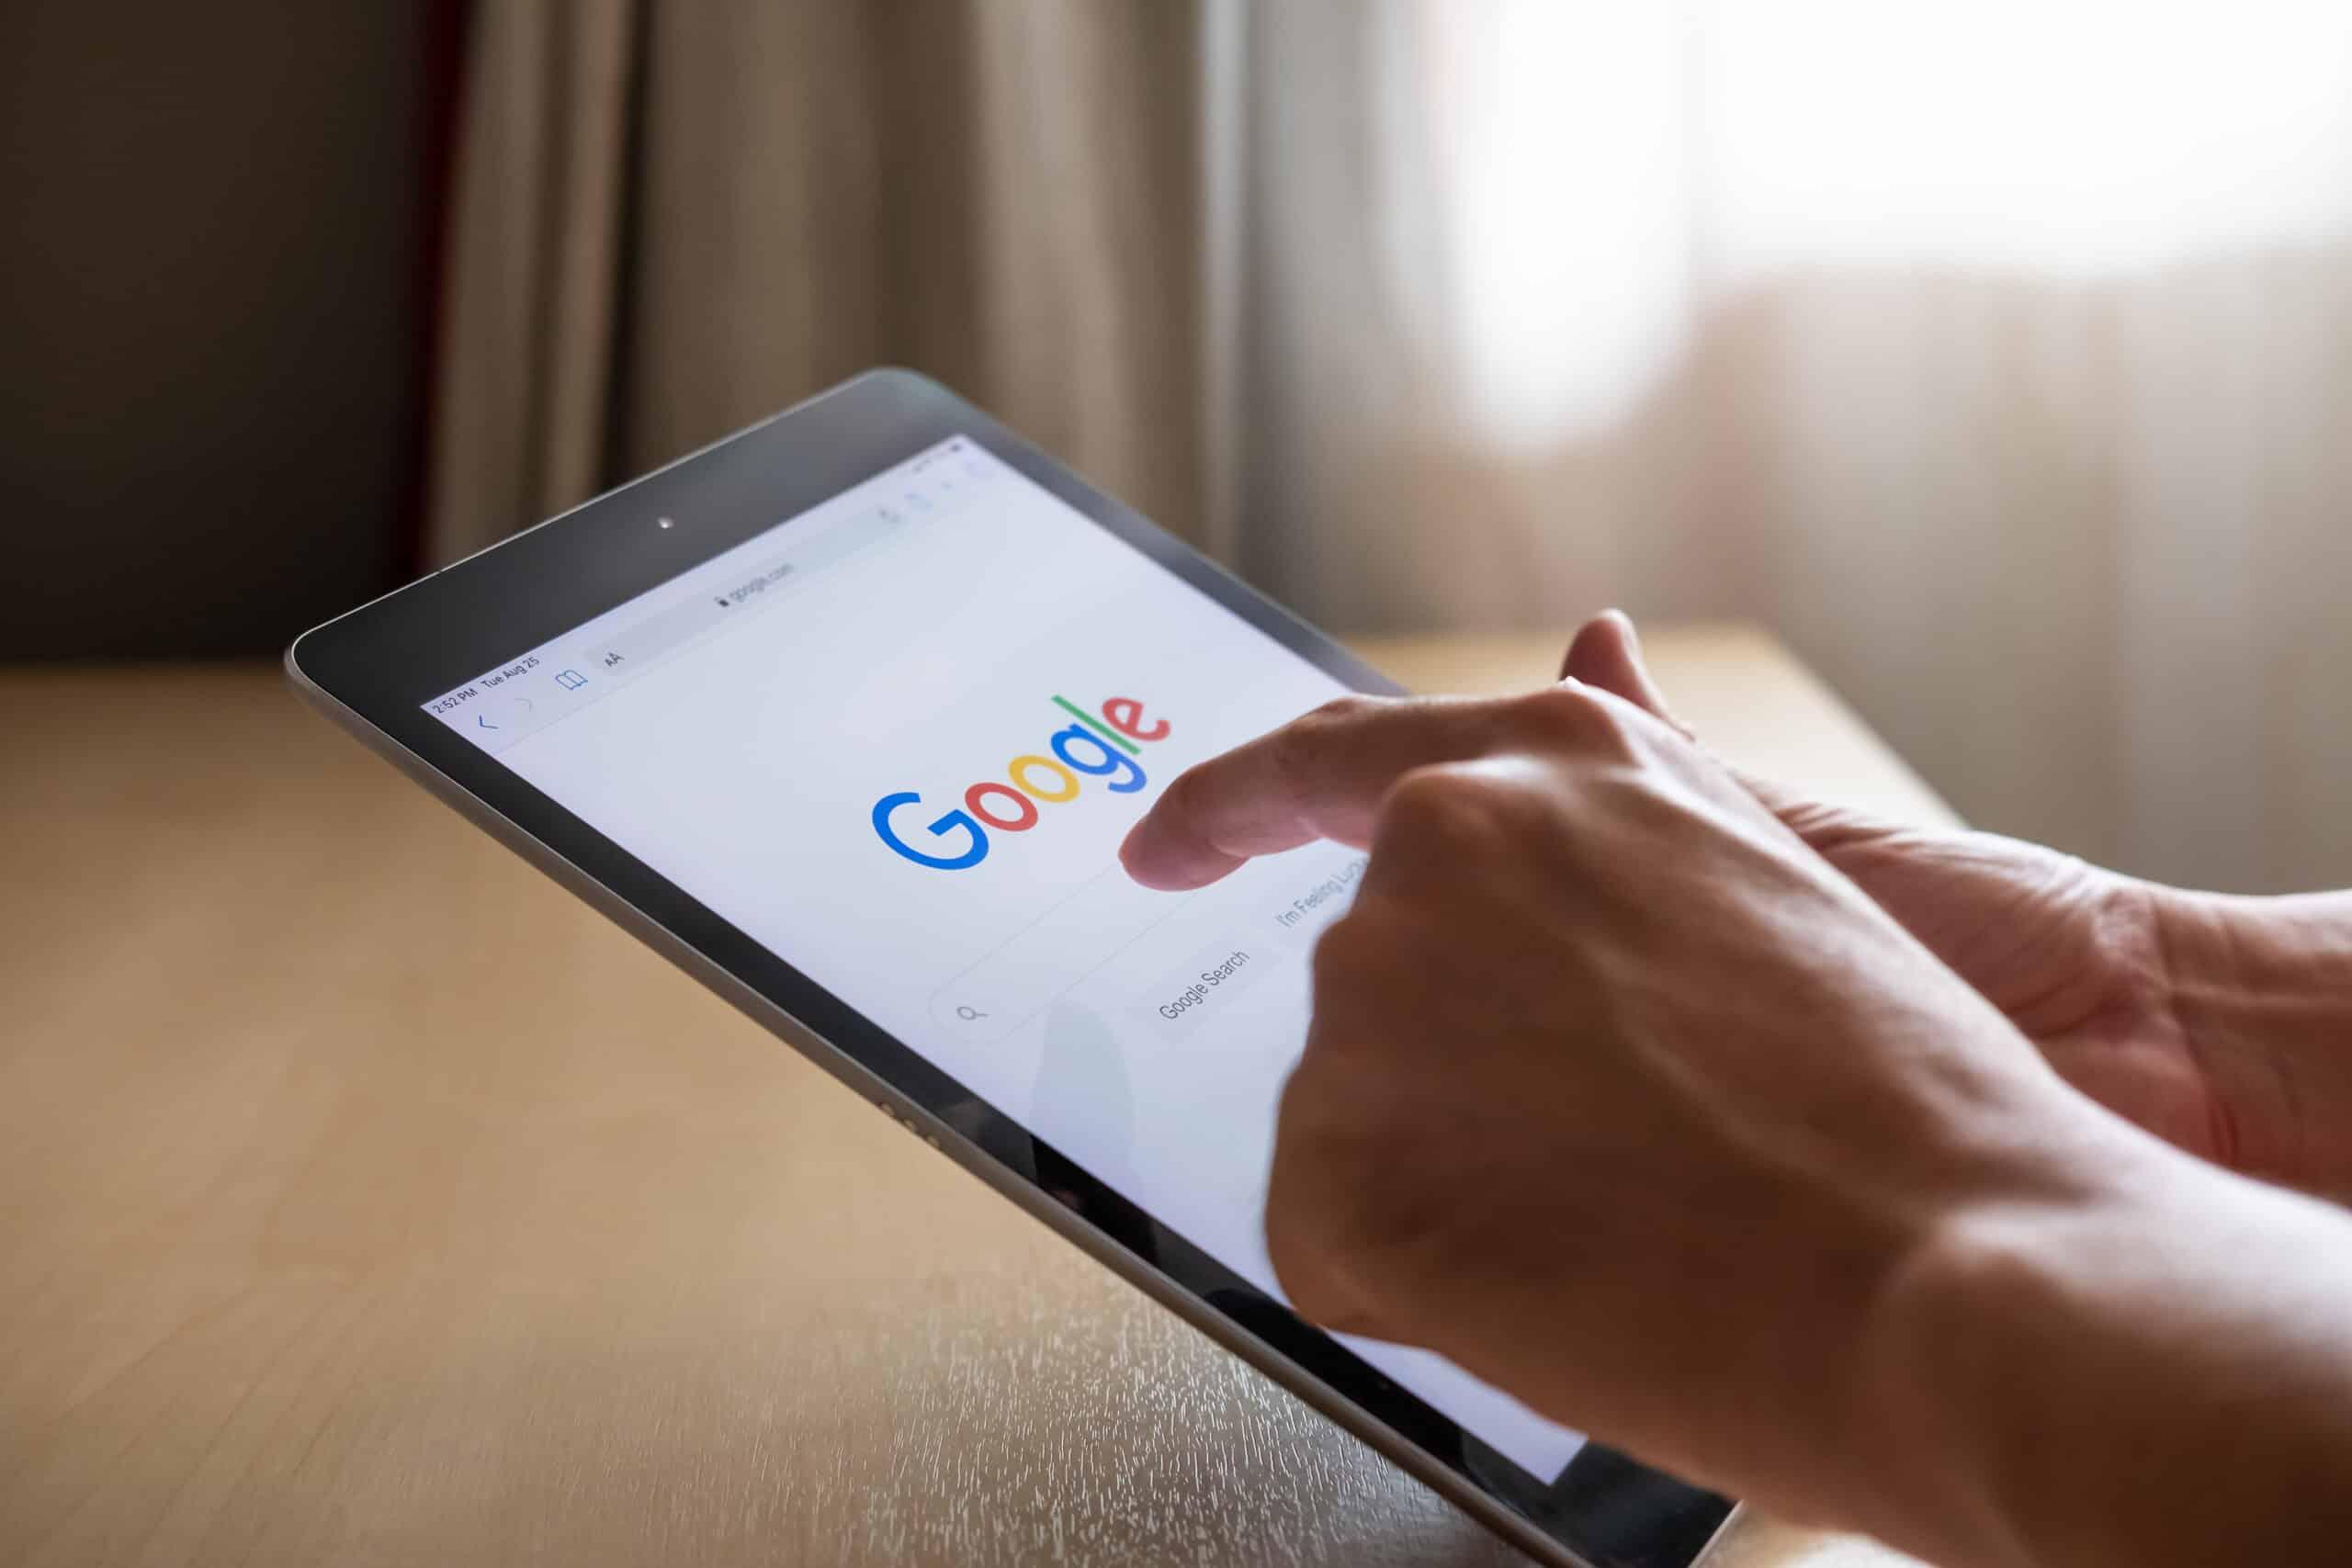 iPad User searching on Google